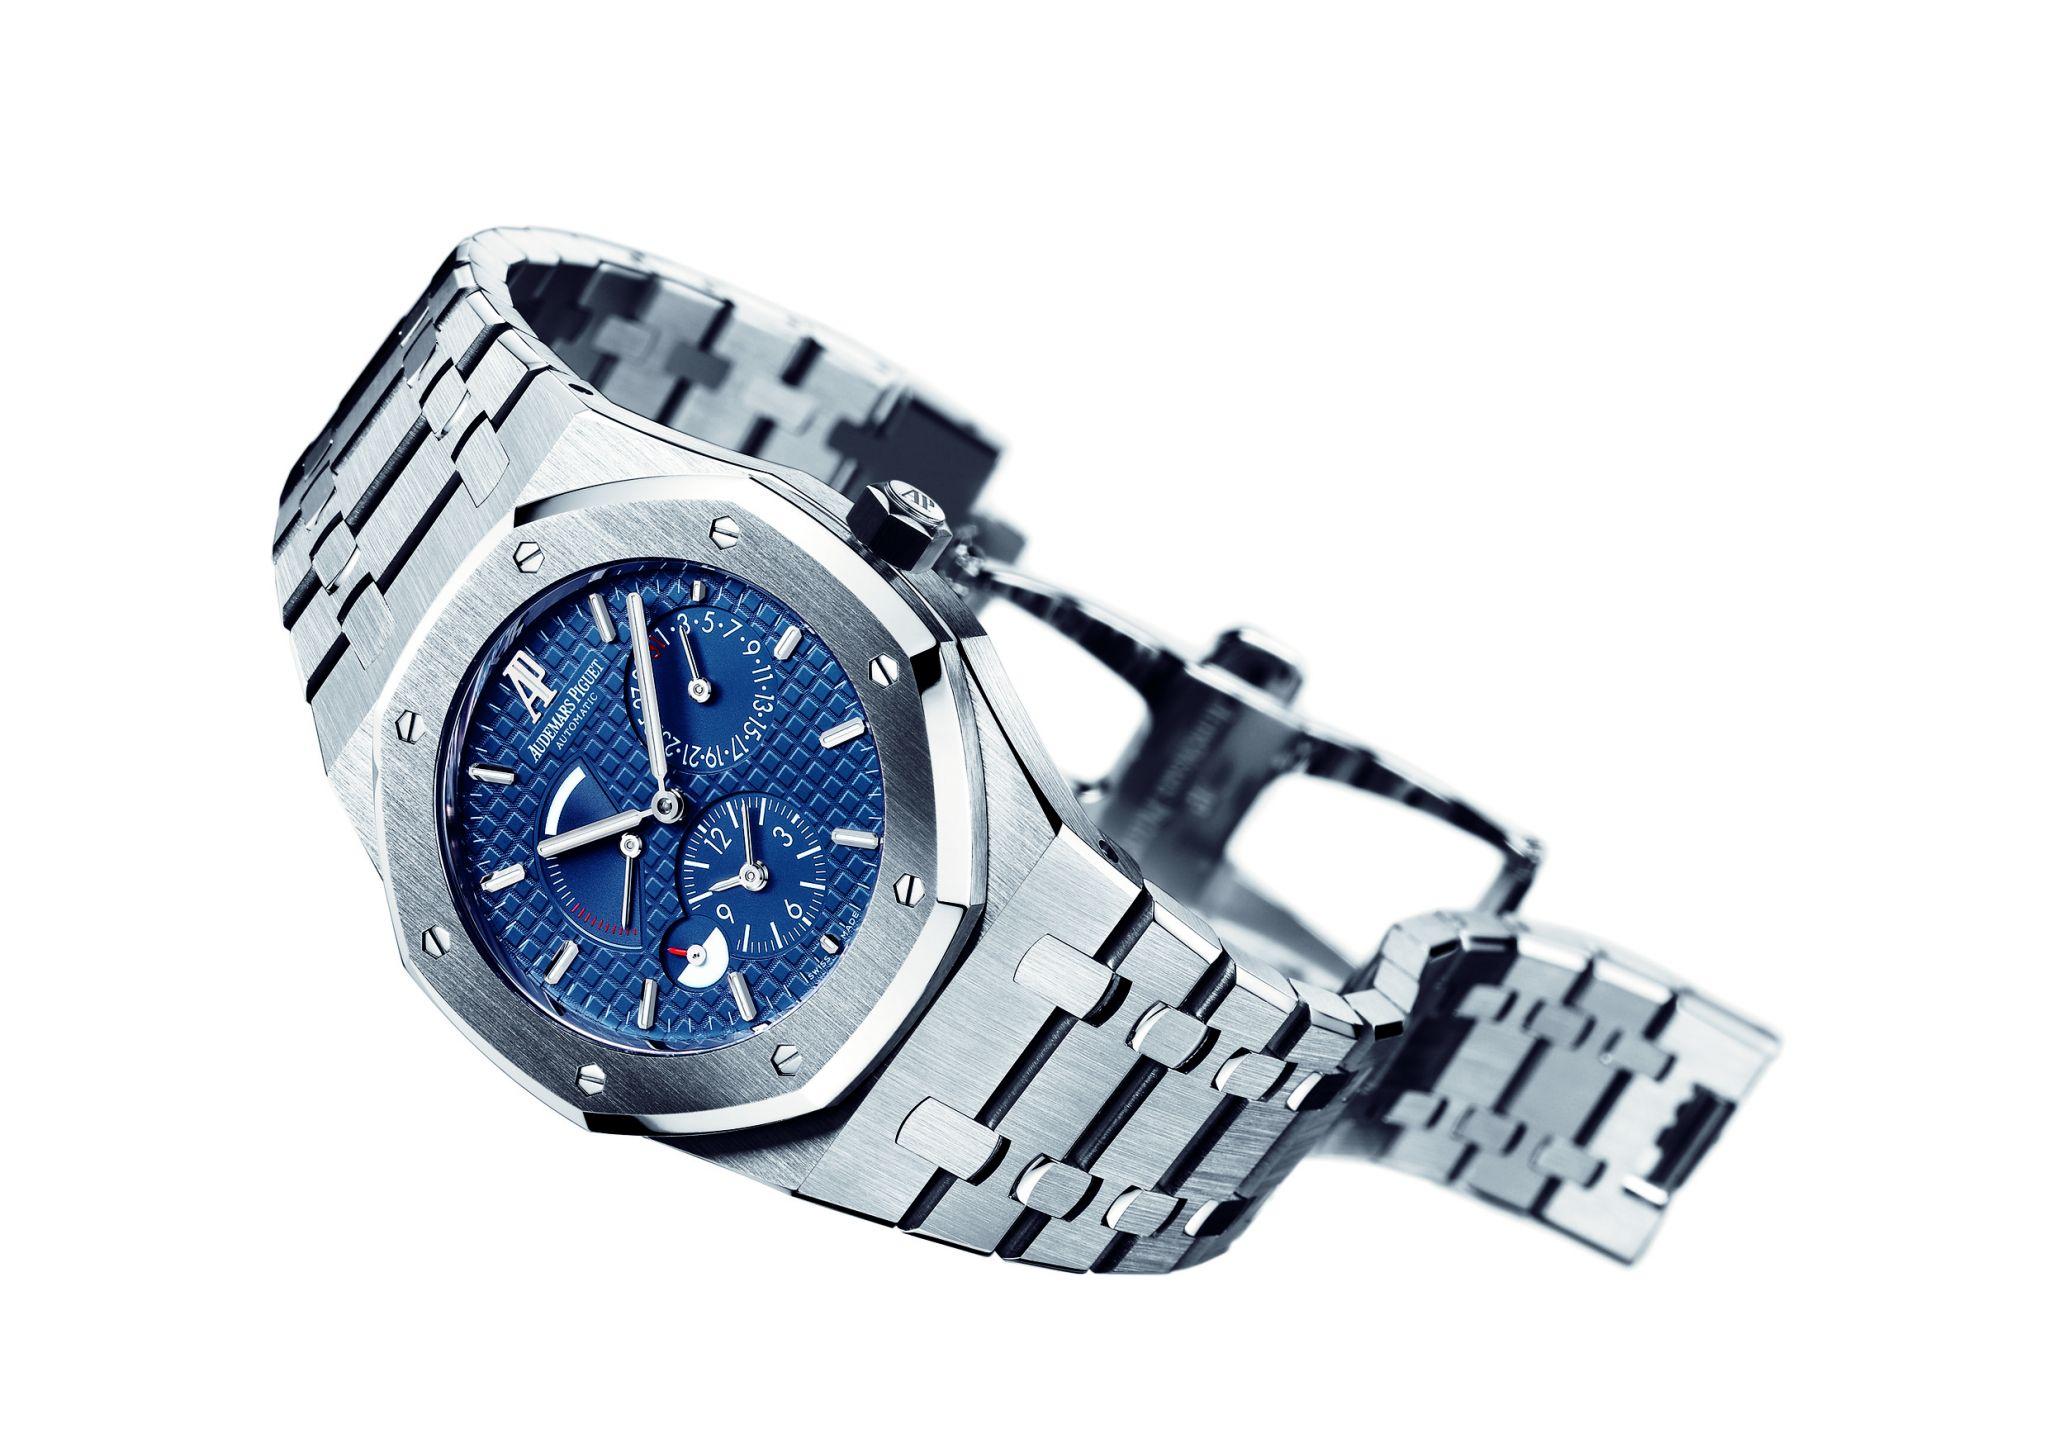 Audemars Piguet Royal Oak Dual Time Men's Watch